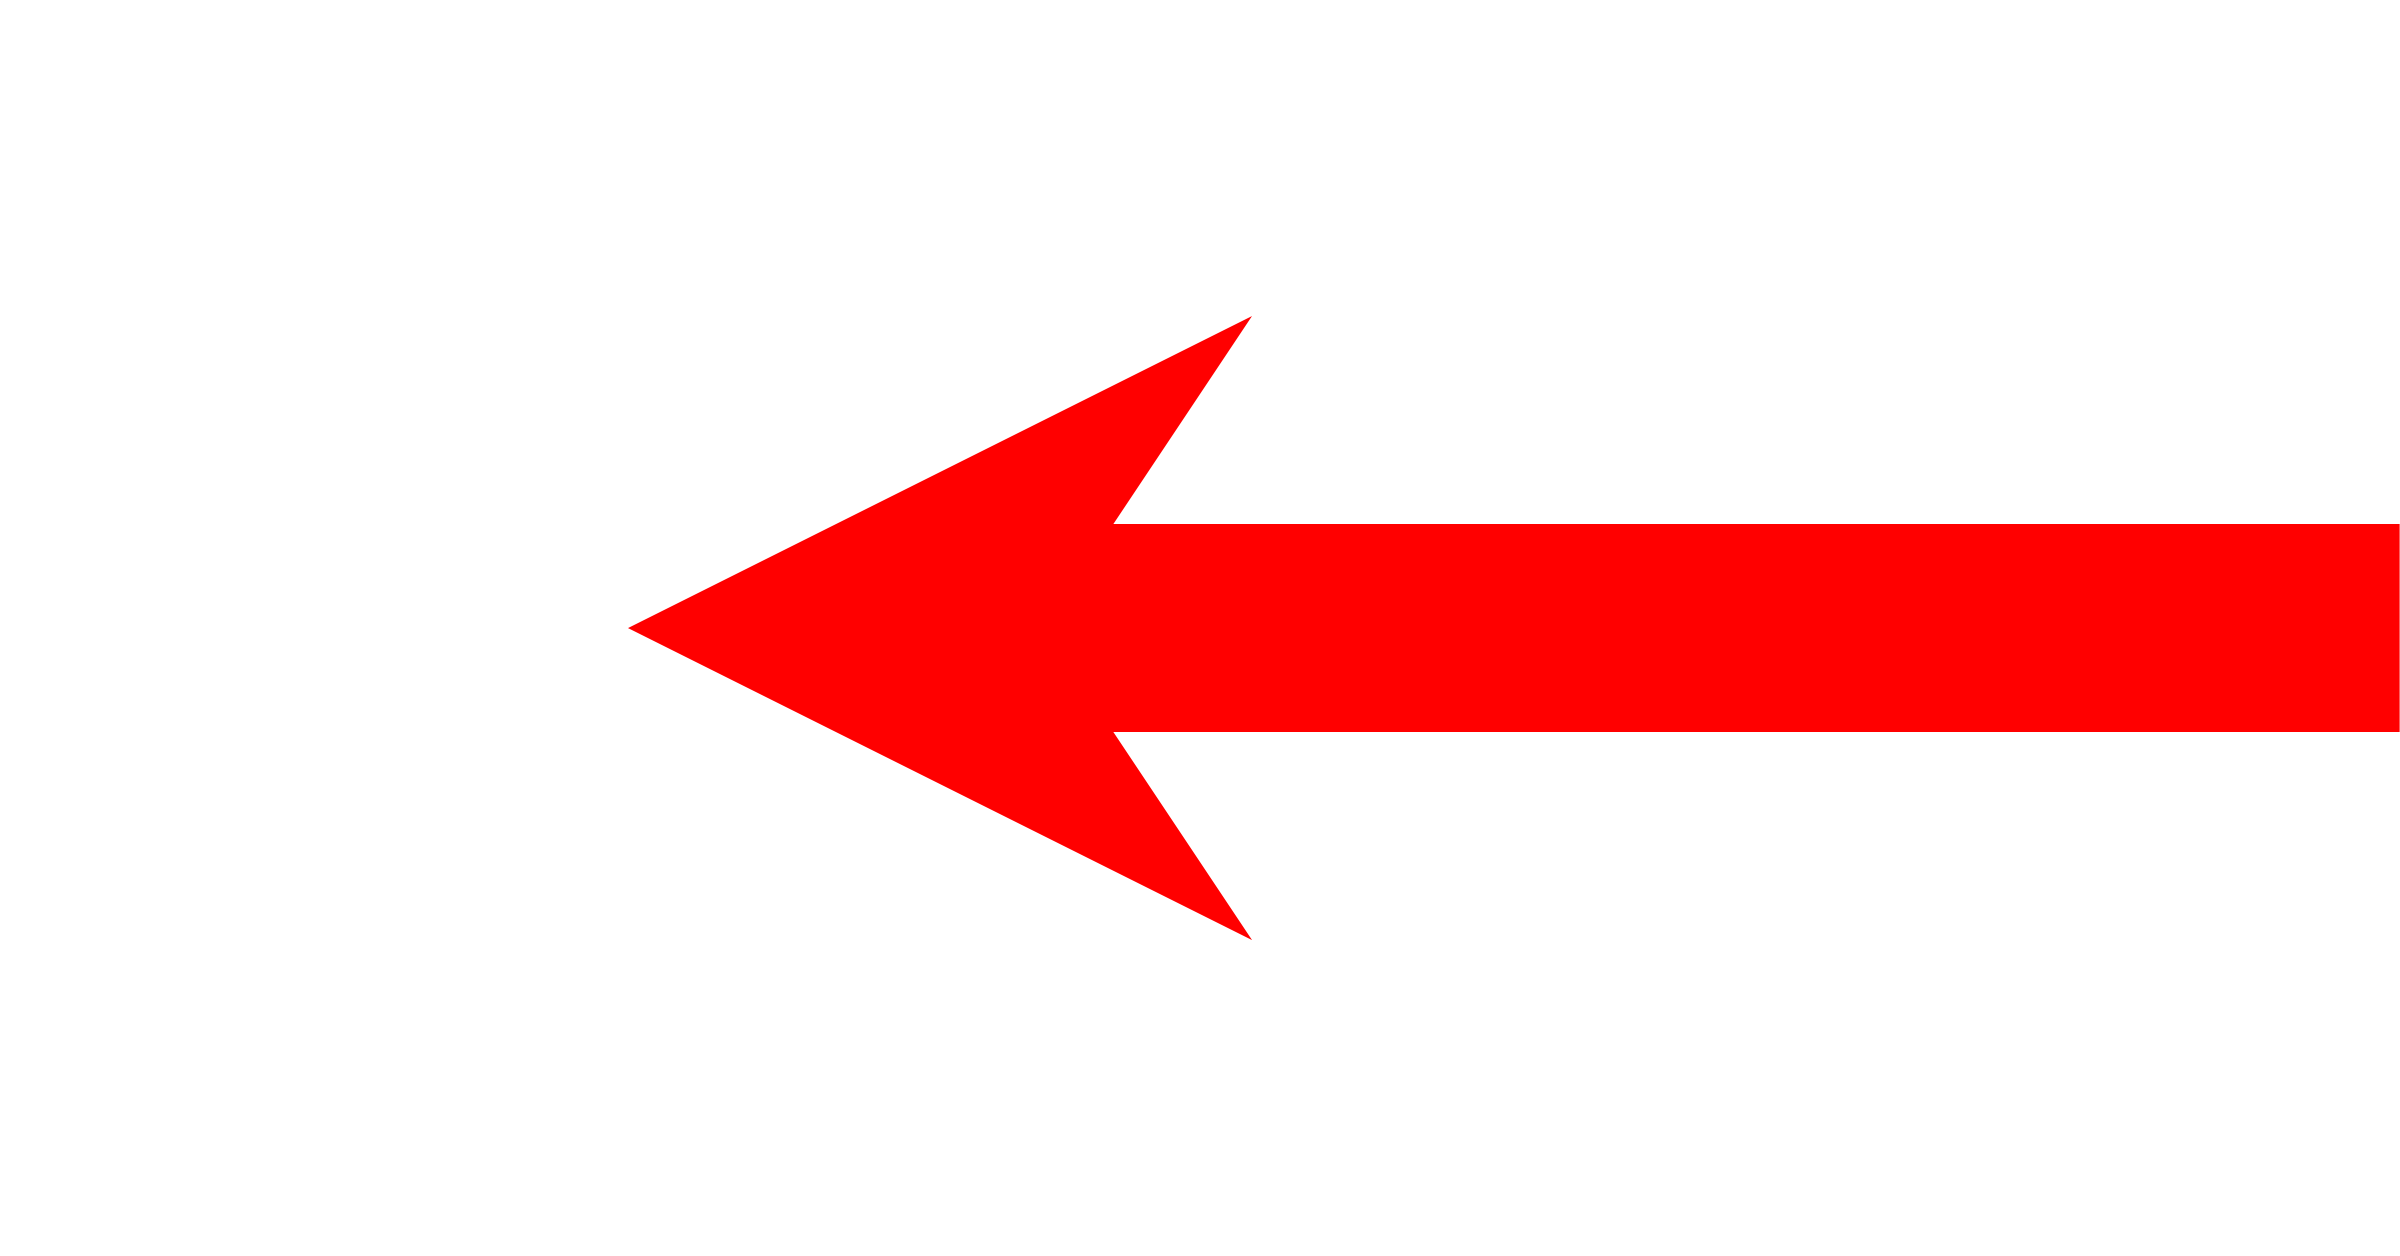 2400x1256 Fileshort Left Arrow